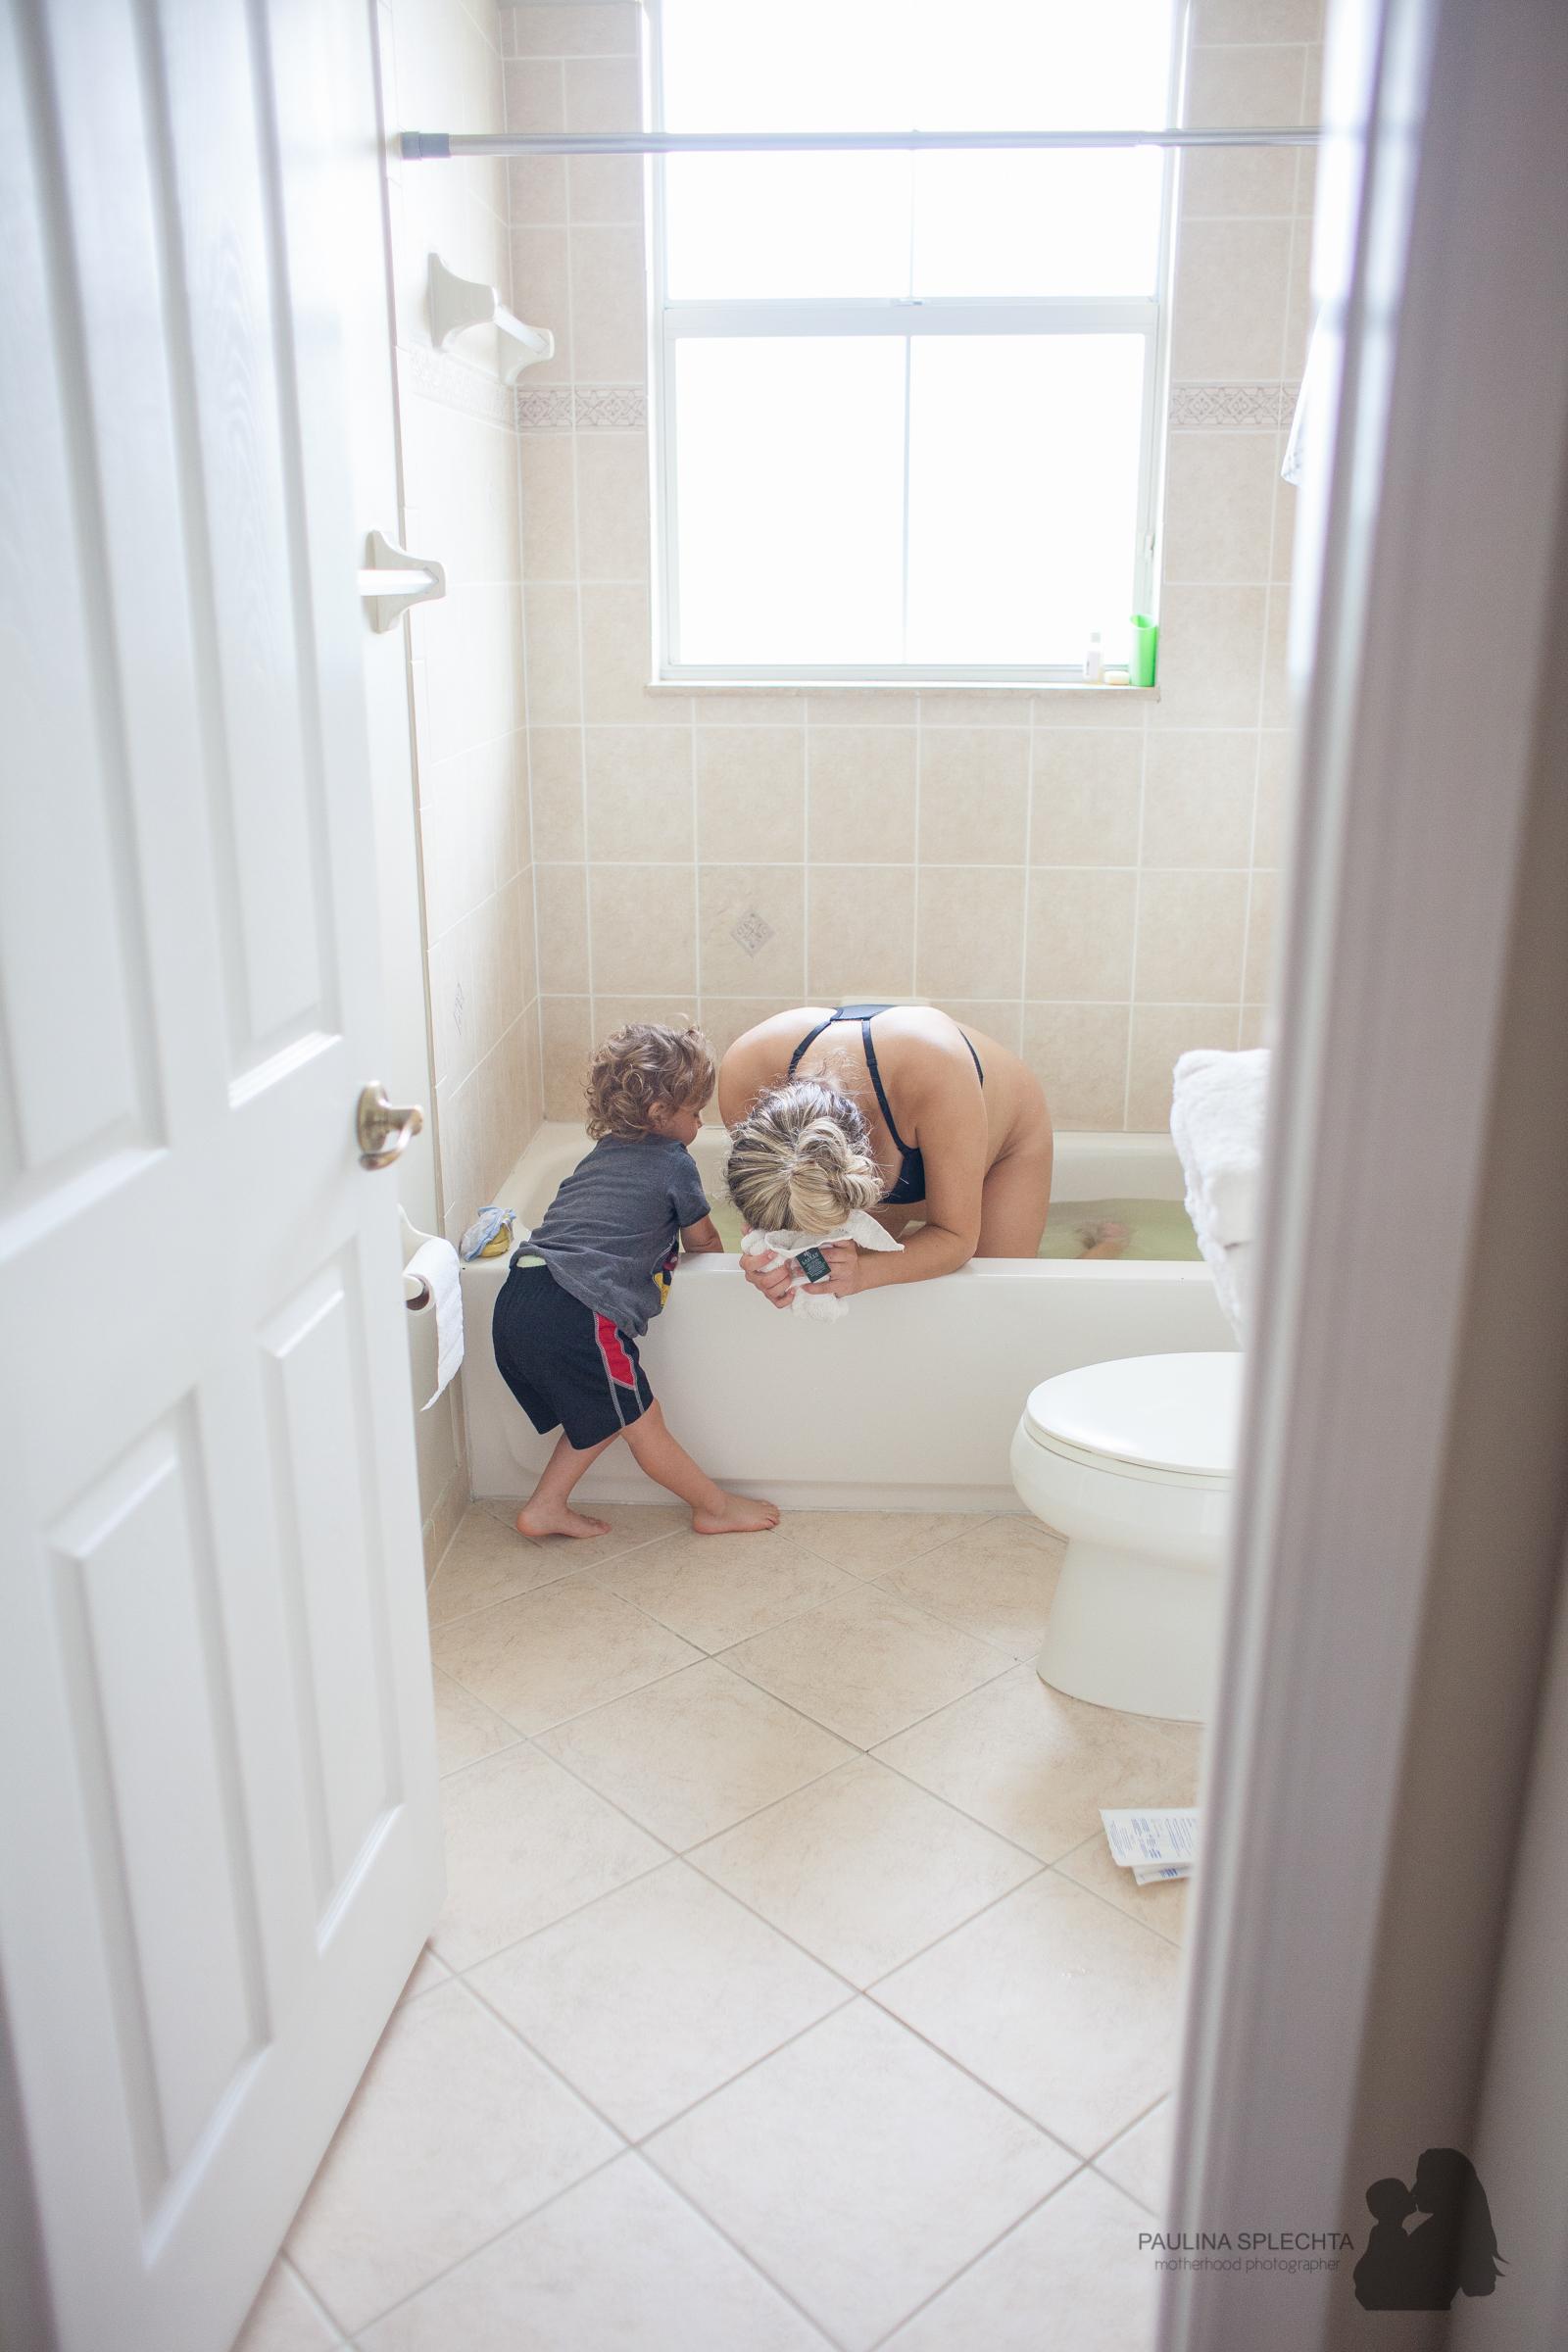 bocabirthphotographer-boca-birth-photographer-birth-center-hospital-hypnobirthing-midwife-doula-trimester-breastfeeding-florida-hollywood-delray-stop-nausea-morning-sickness-1.jpg